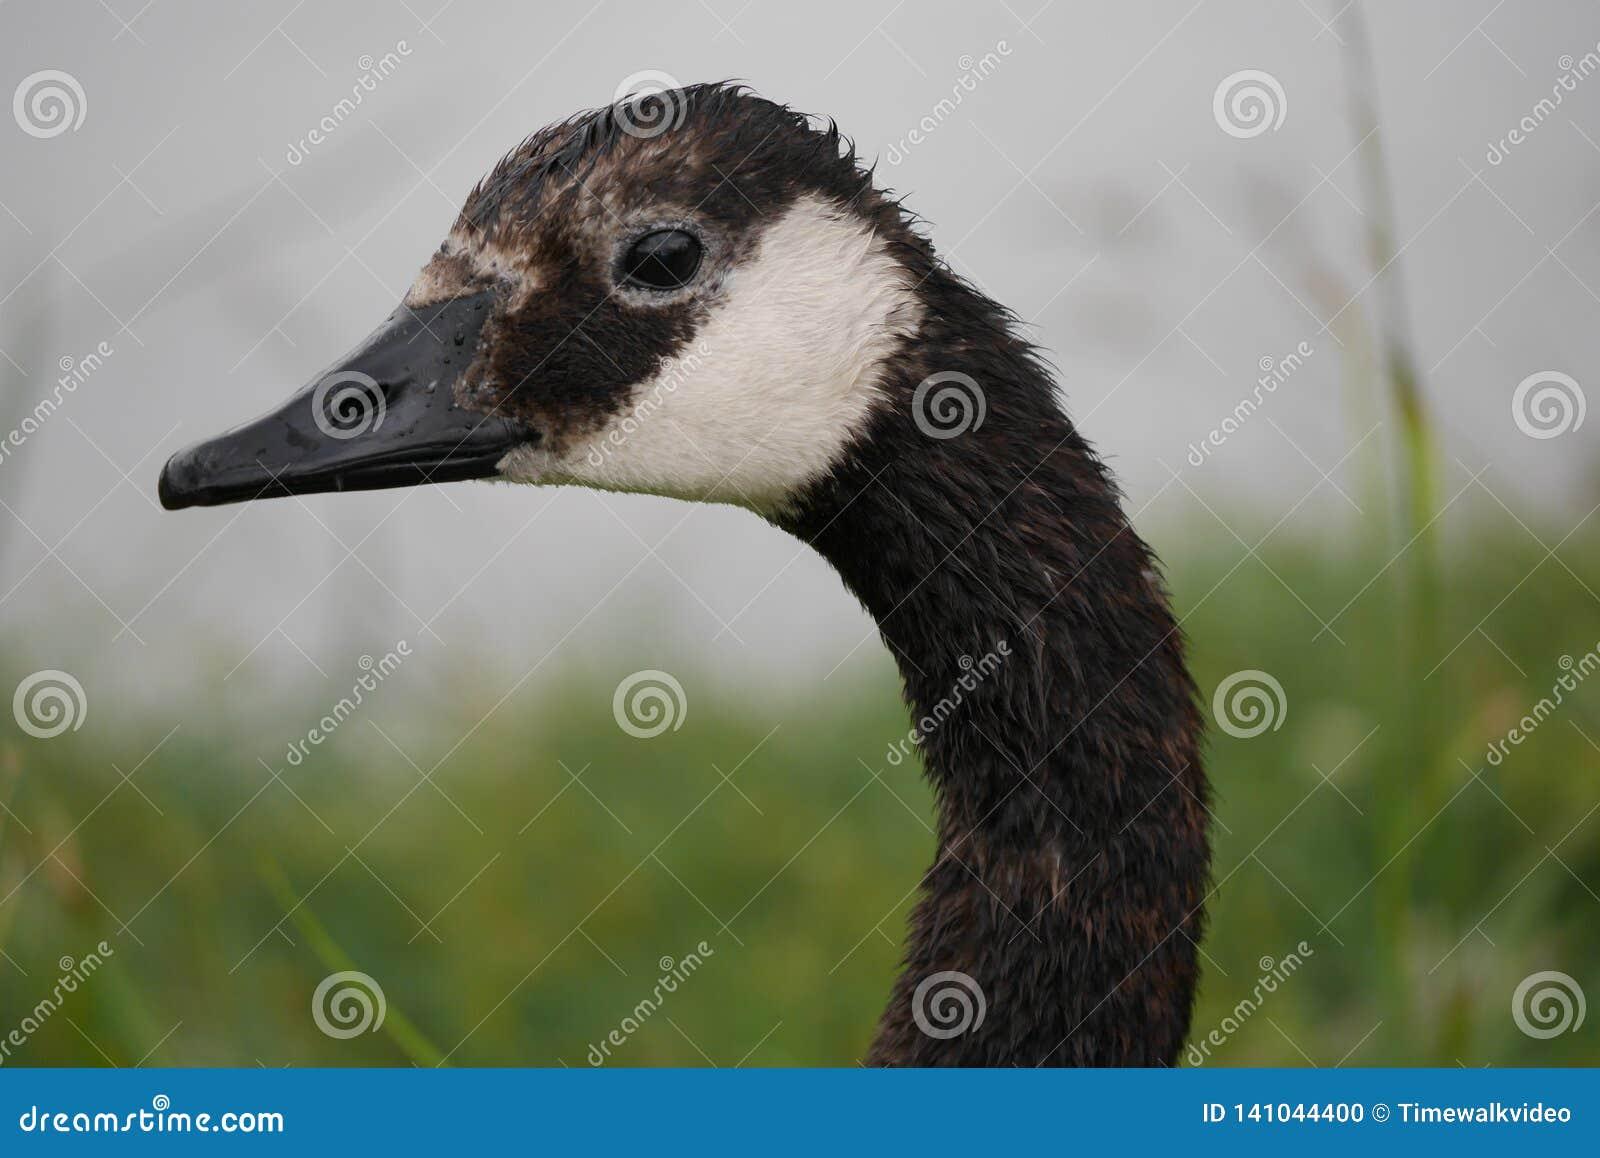 Close-Up Profile of Canadian Goose